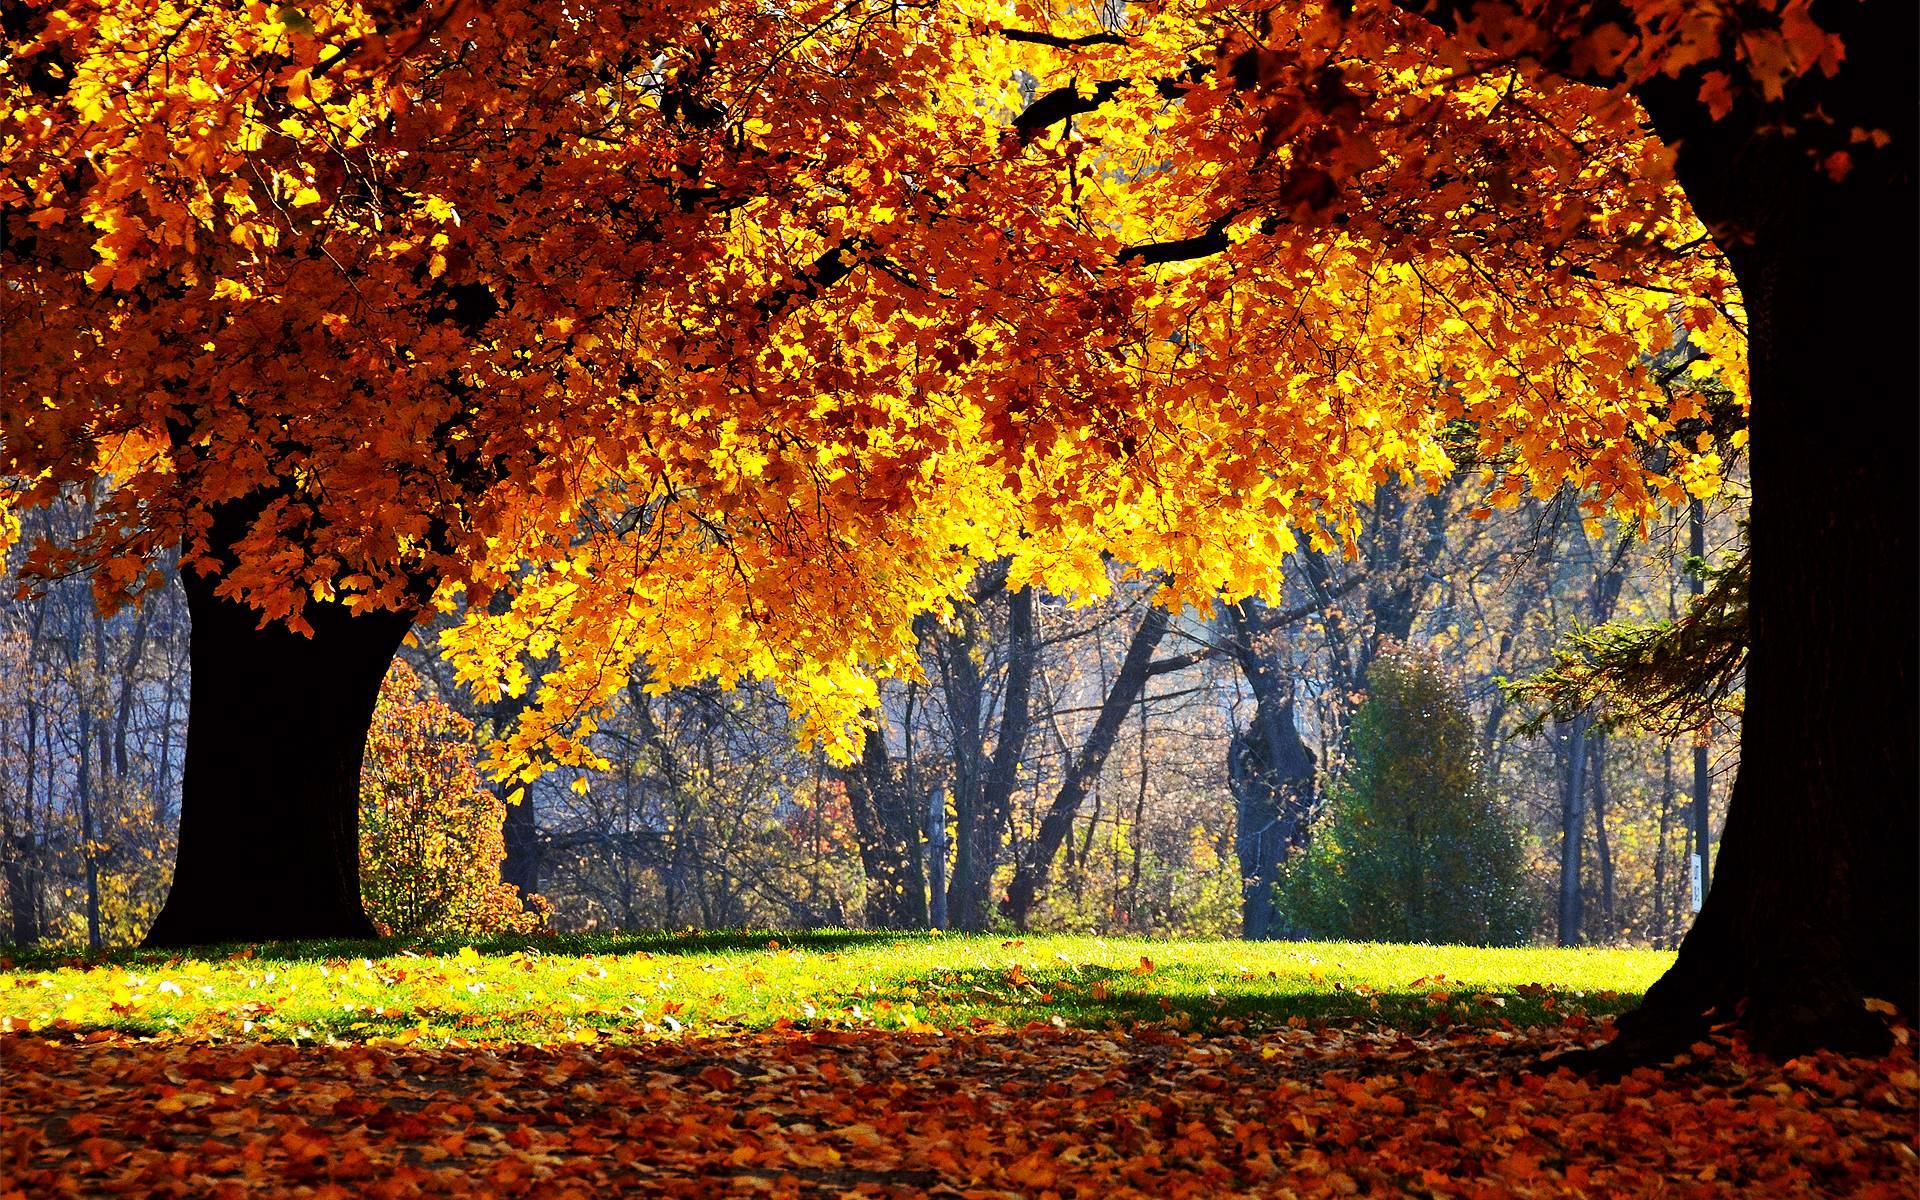 autumn photographs wallpapers miriadna